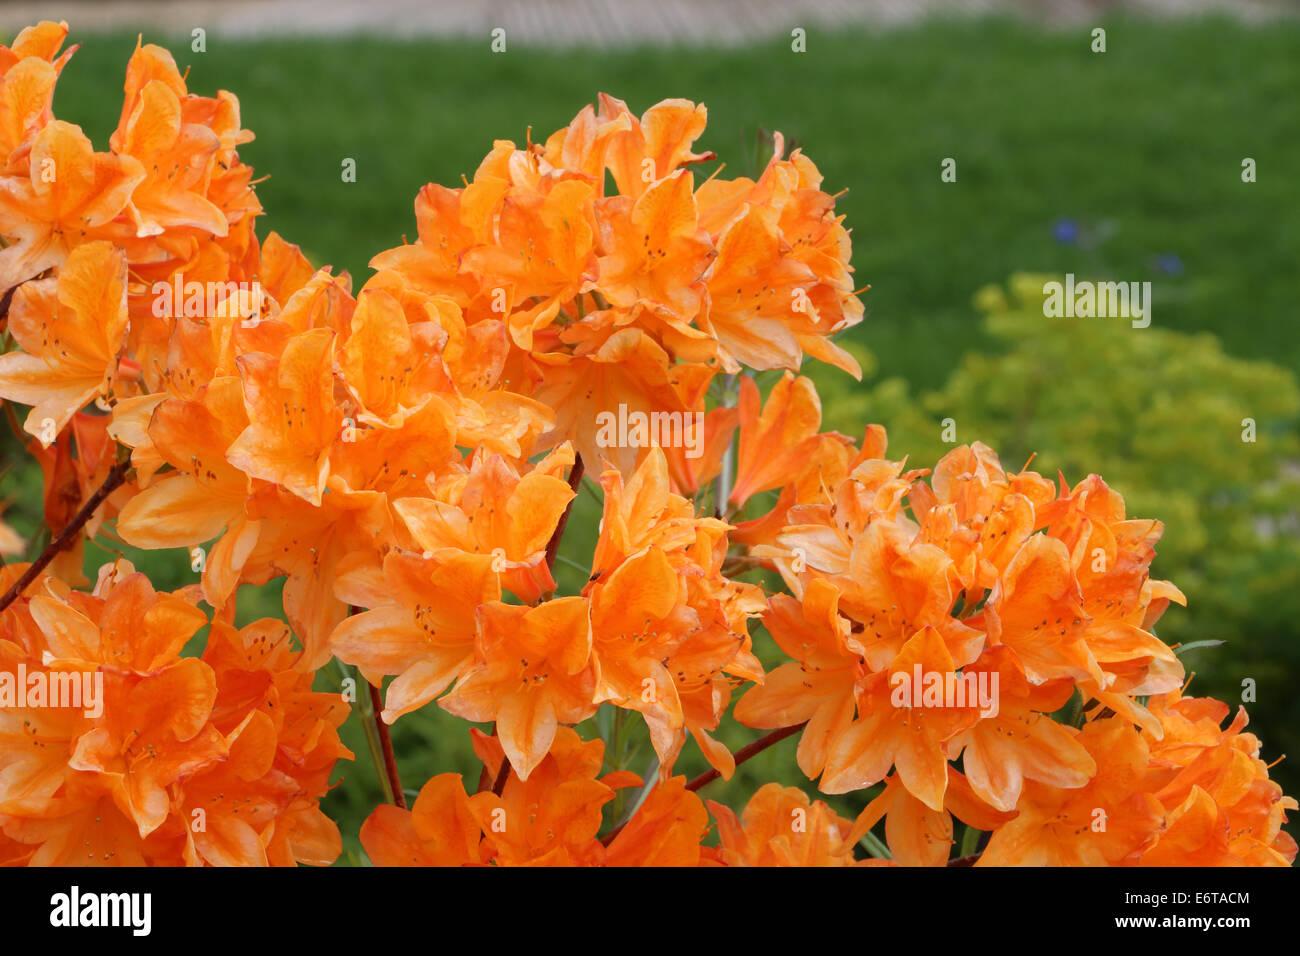 Azaleas tangerine orange - Stock Image